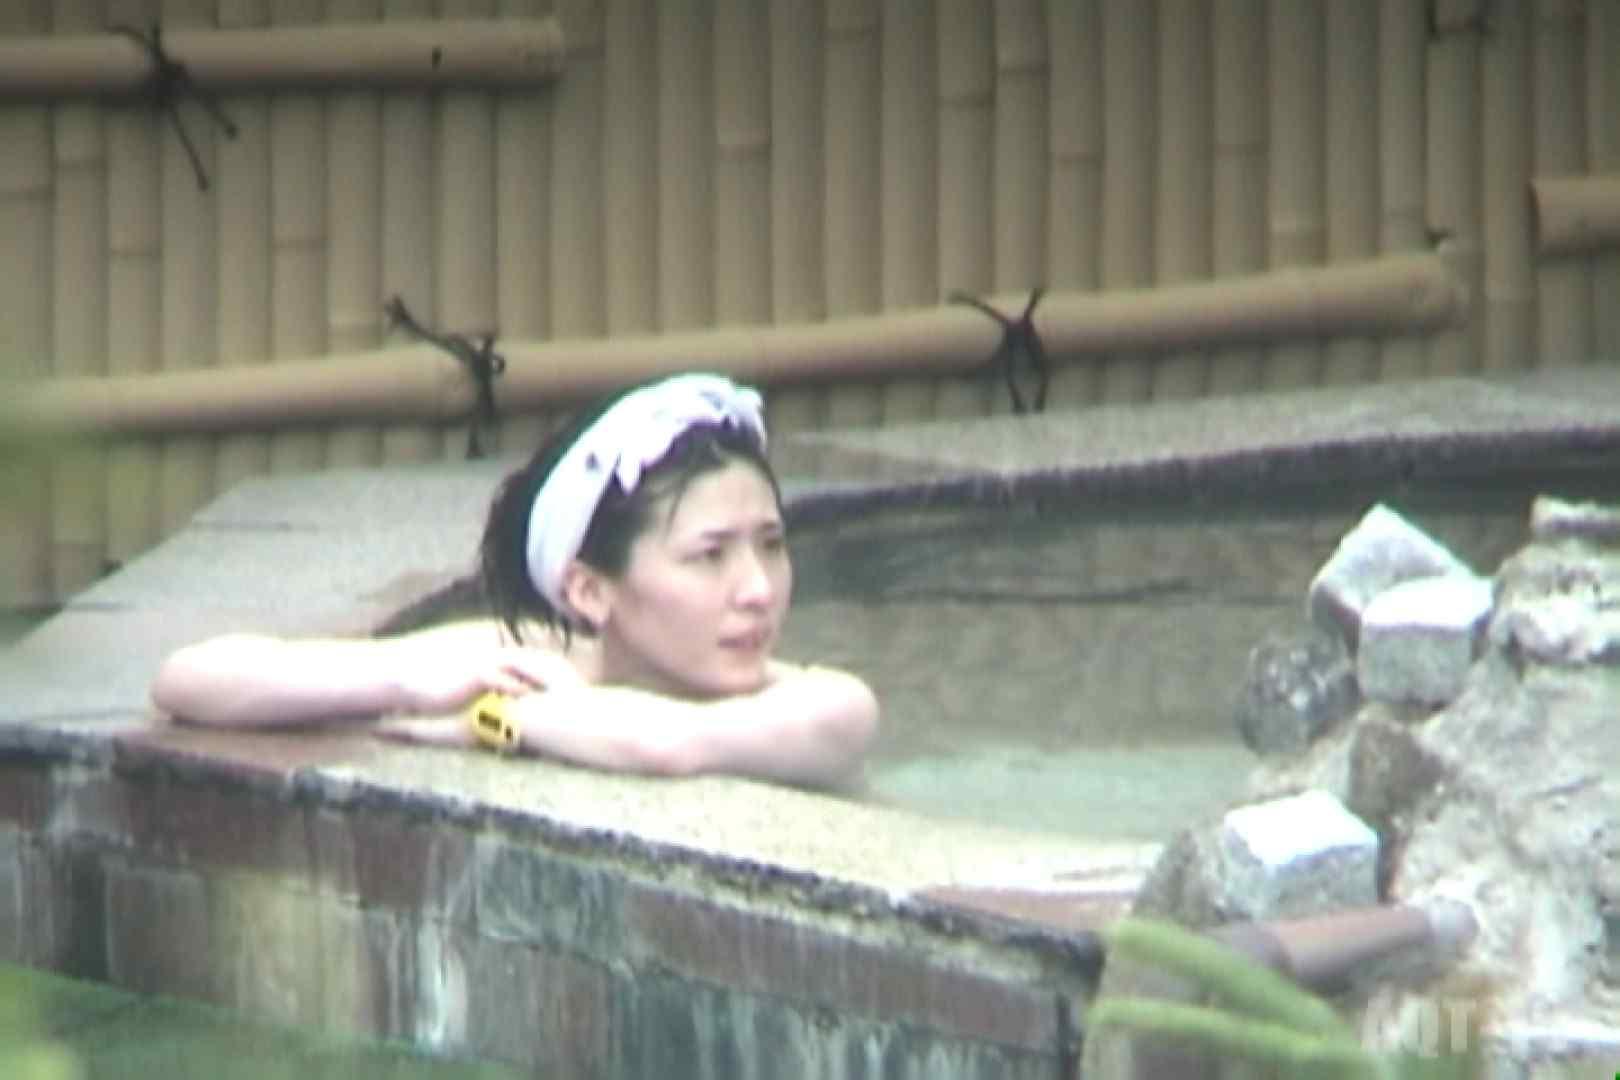 Aquaな露天風呂Vol.793 盗撮映像  72Pix 26